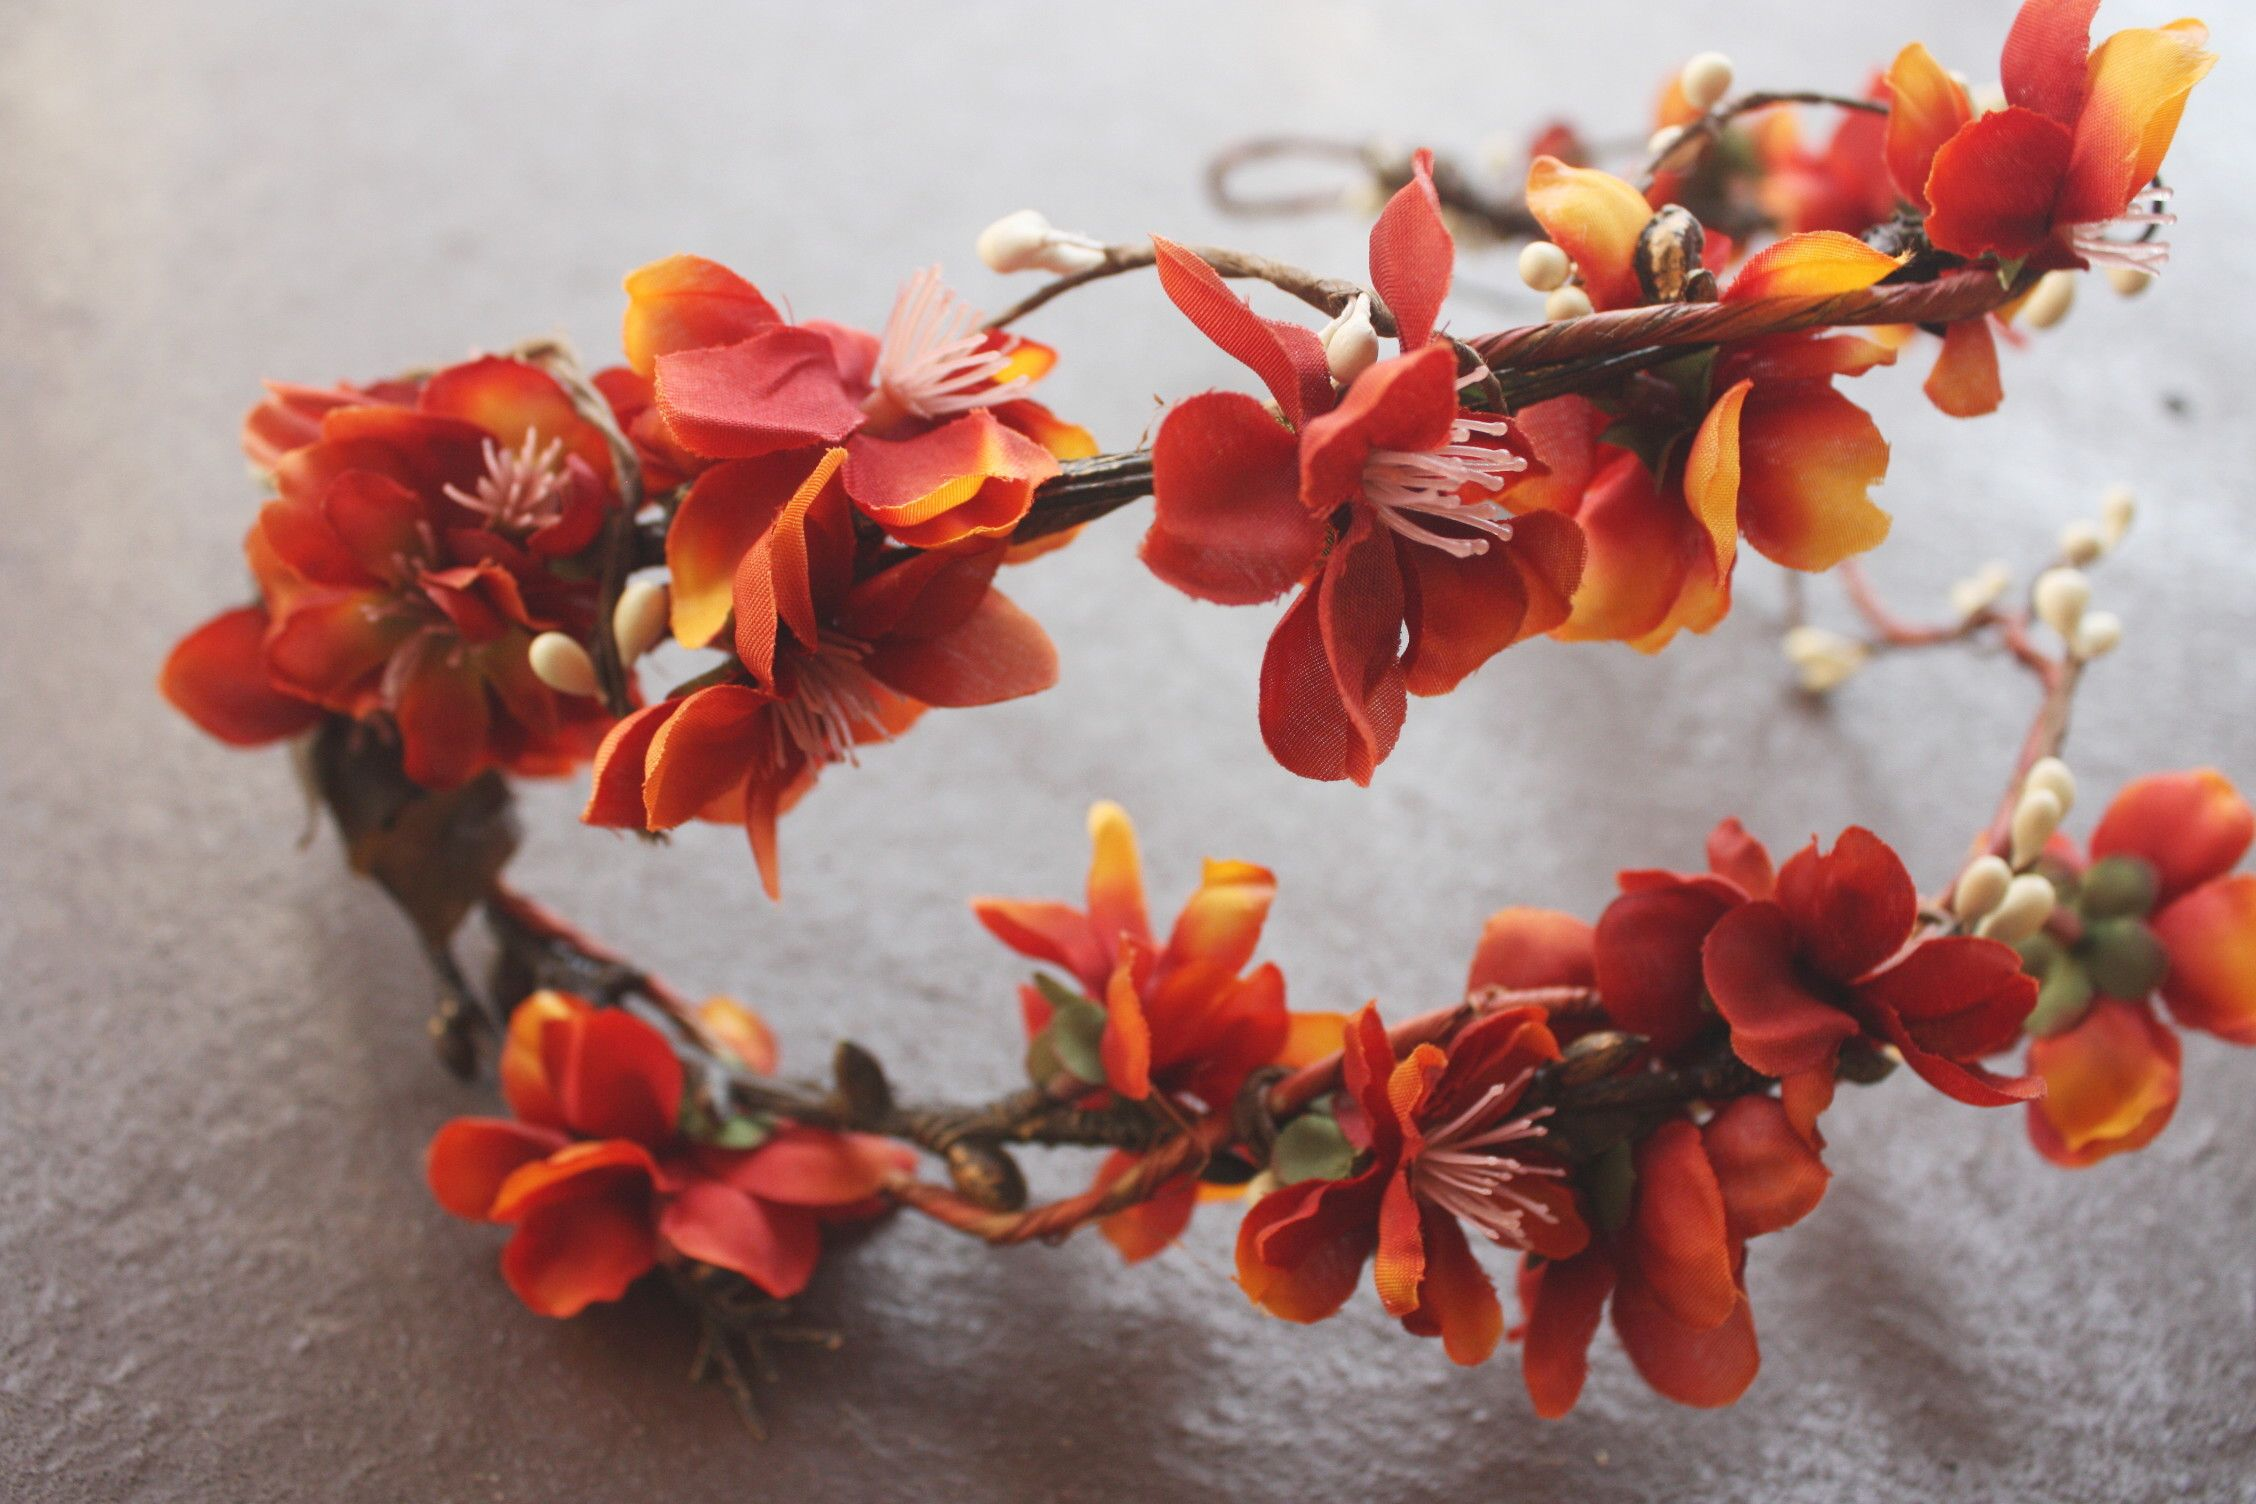 Vintage hair flower crowns by whimsical wildfox accessories boho vintage hair flower crowns by whimsical wildfox accessories boho weddings izmirmasajfo